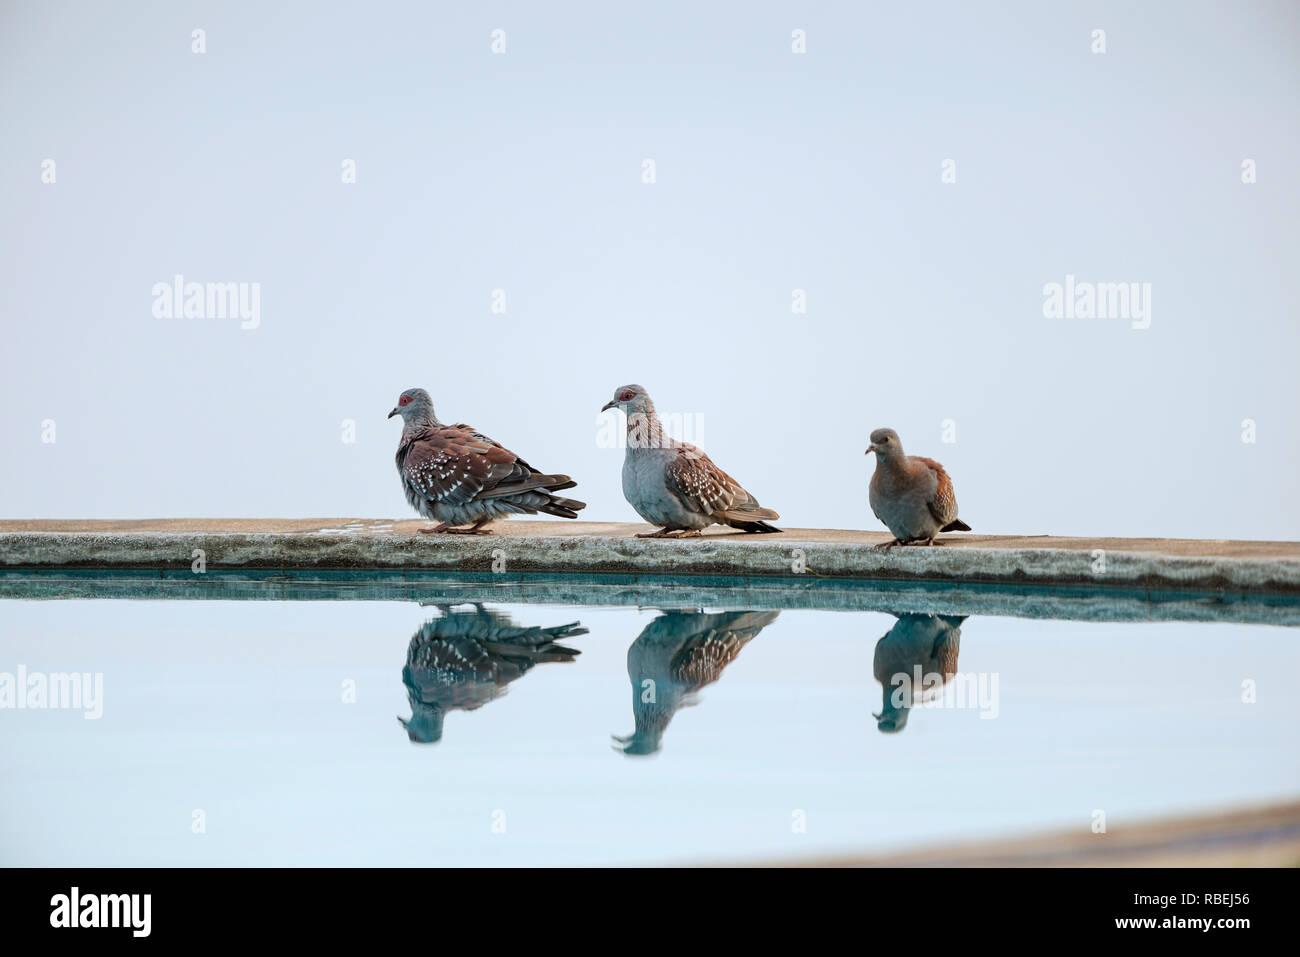 The speckled pigeon, Columba guinea, Nakuru, Kenya, Africa Stock Photo